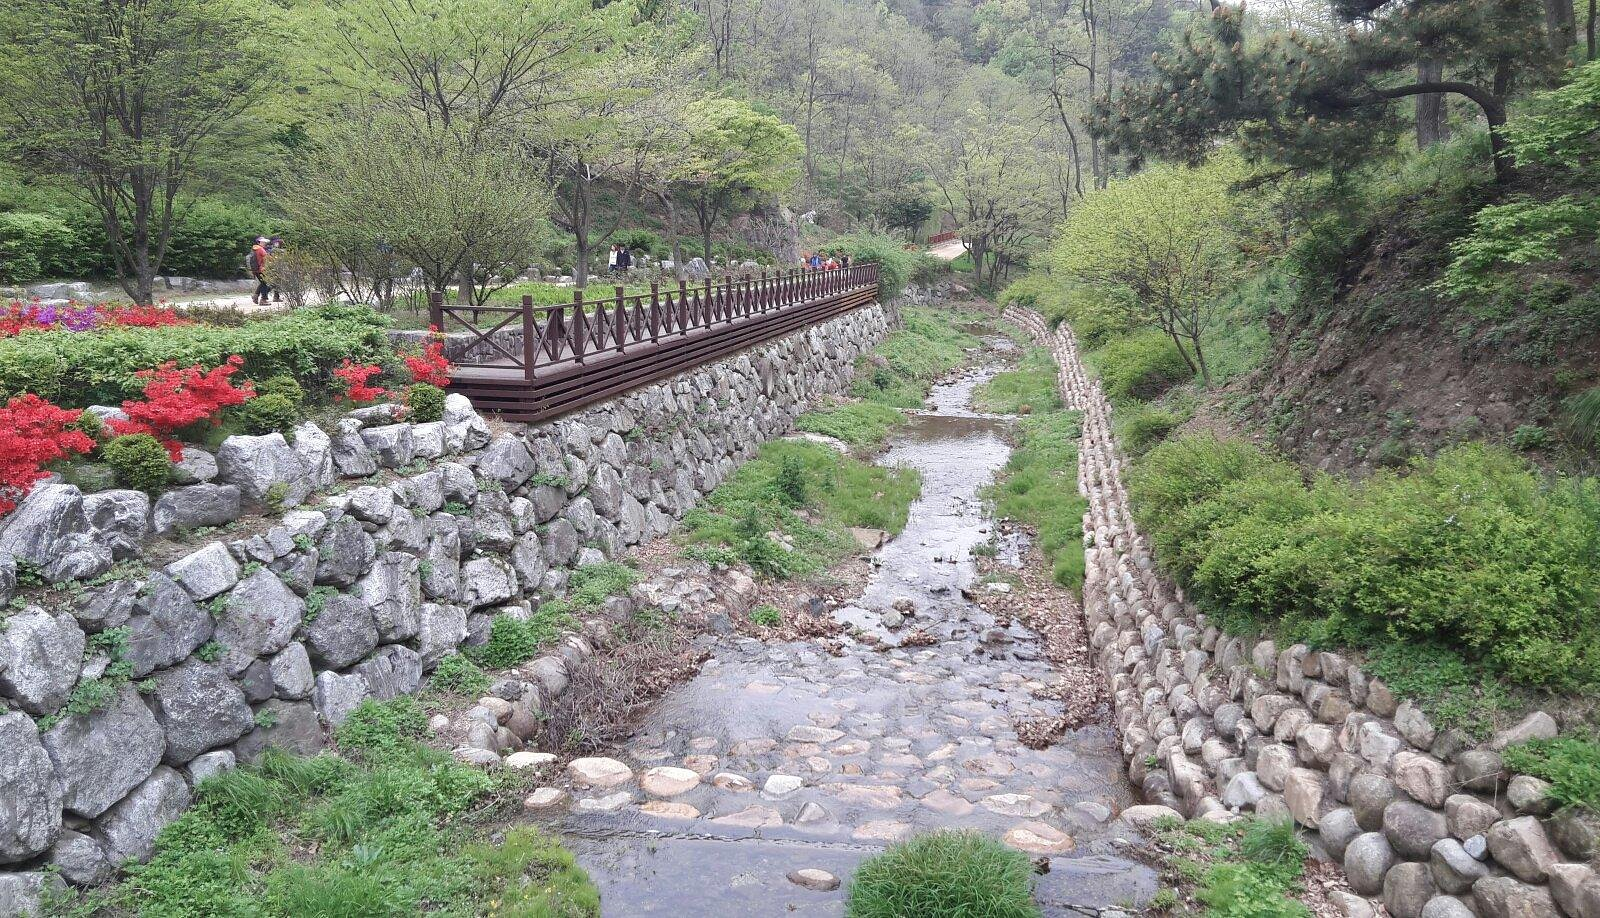 Jungmyeong Ecological Park